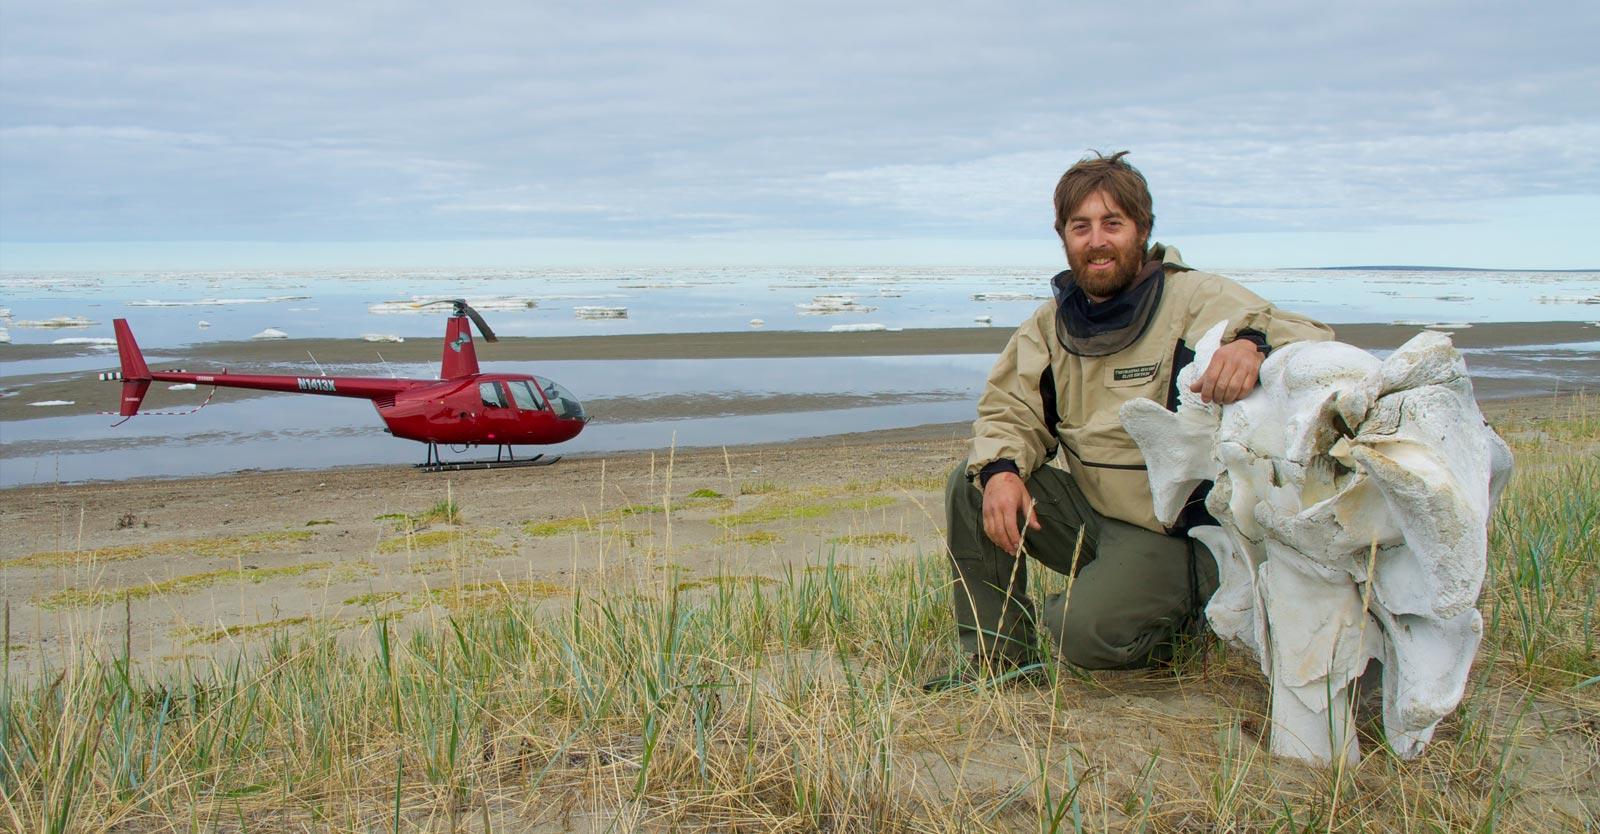 Fairbanks Alaska helicopter pilot Alex Shapiro